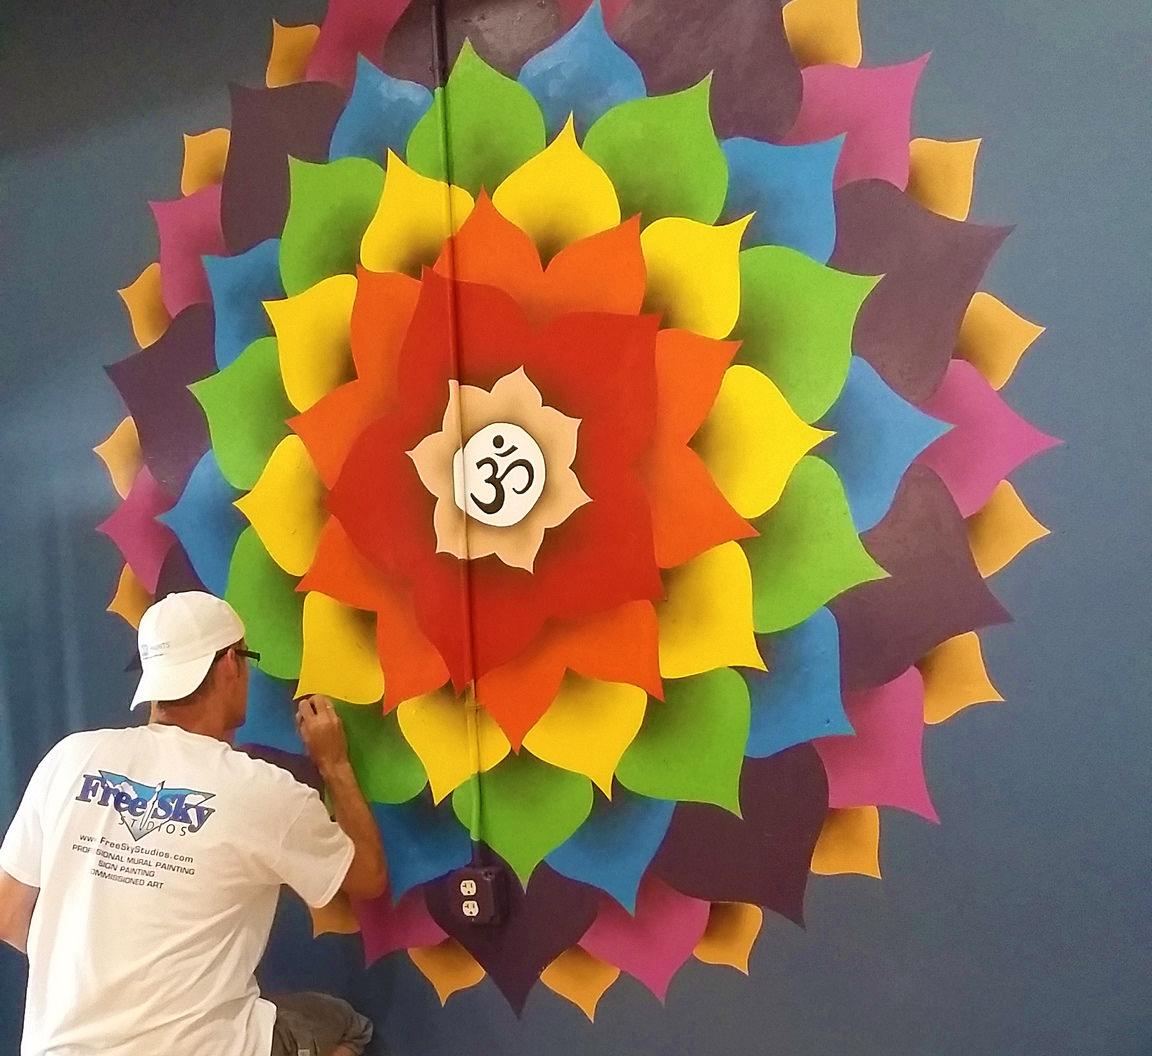 Chakra Lotus Flower Mural Painting Free Sky Studios Professional